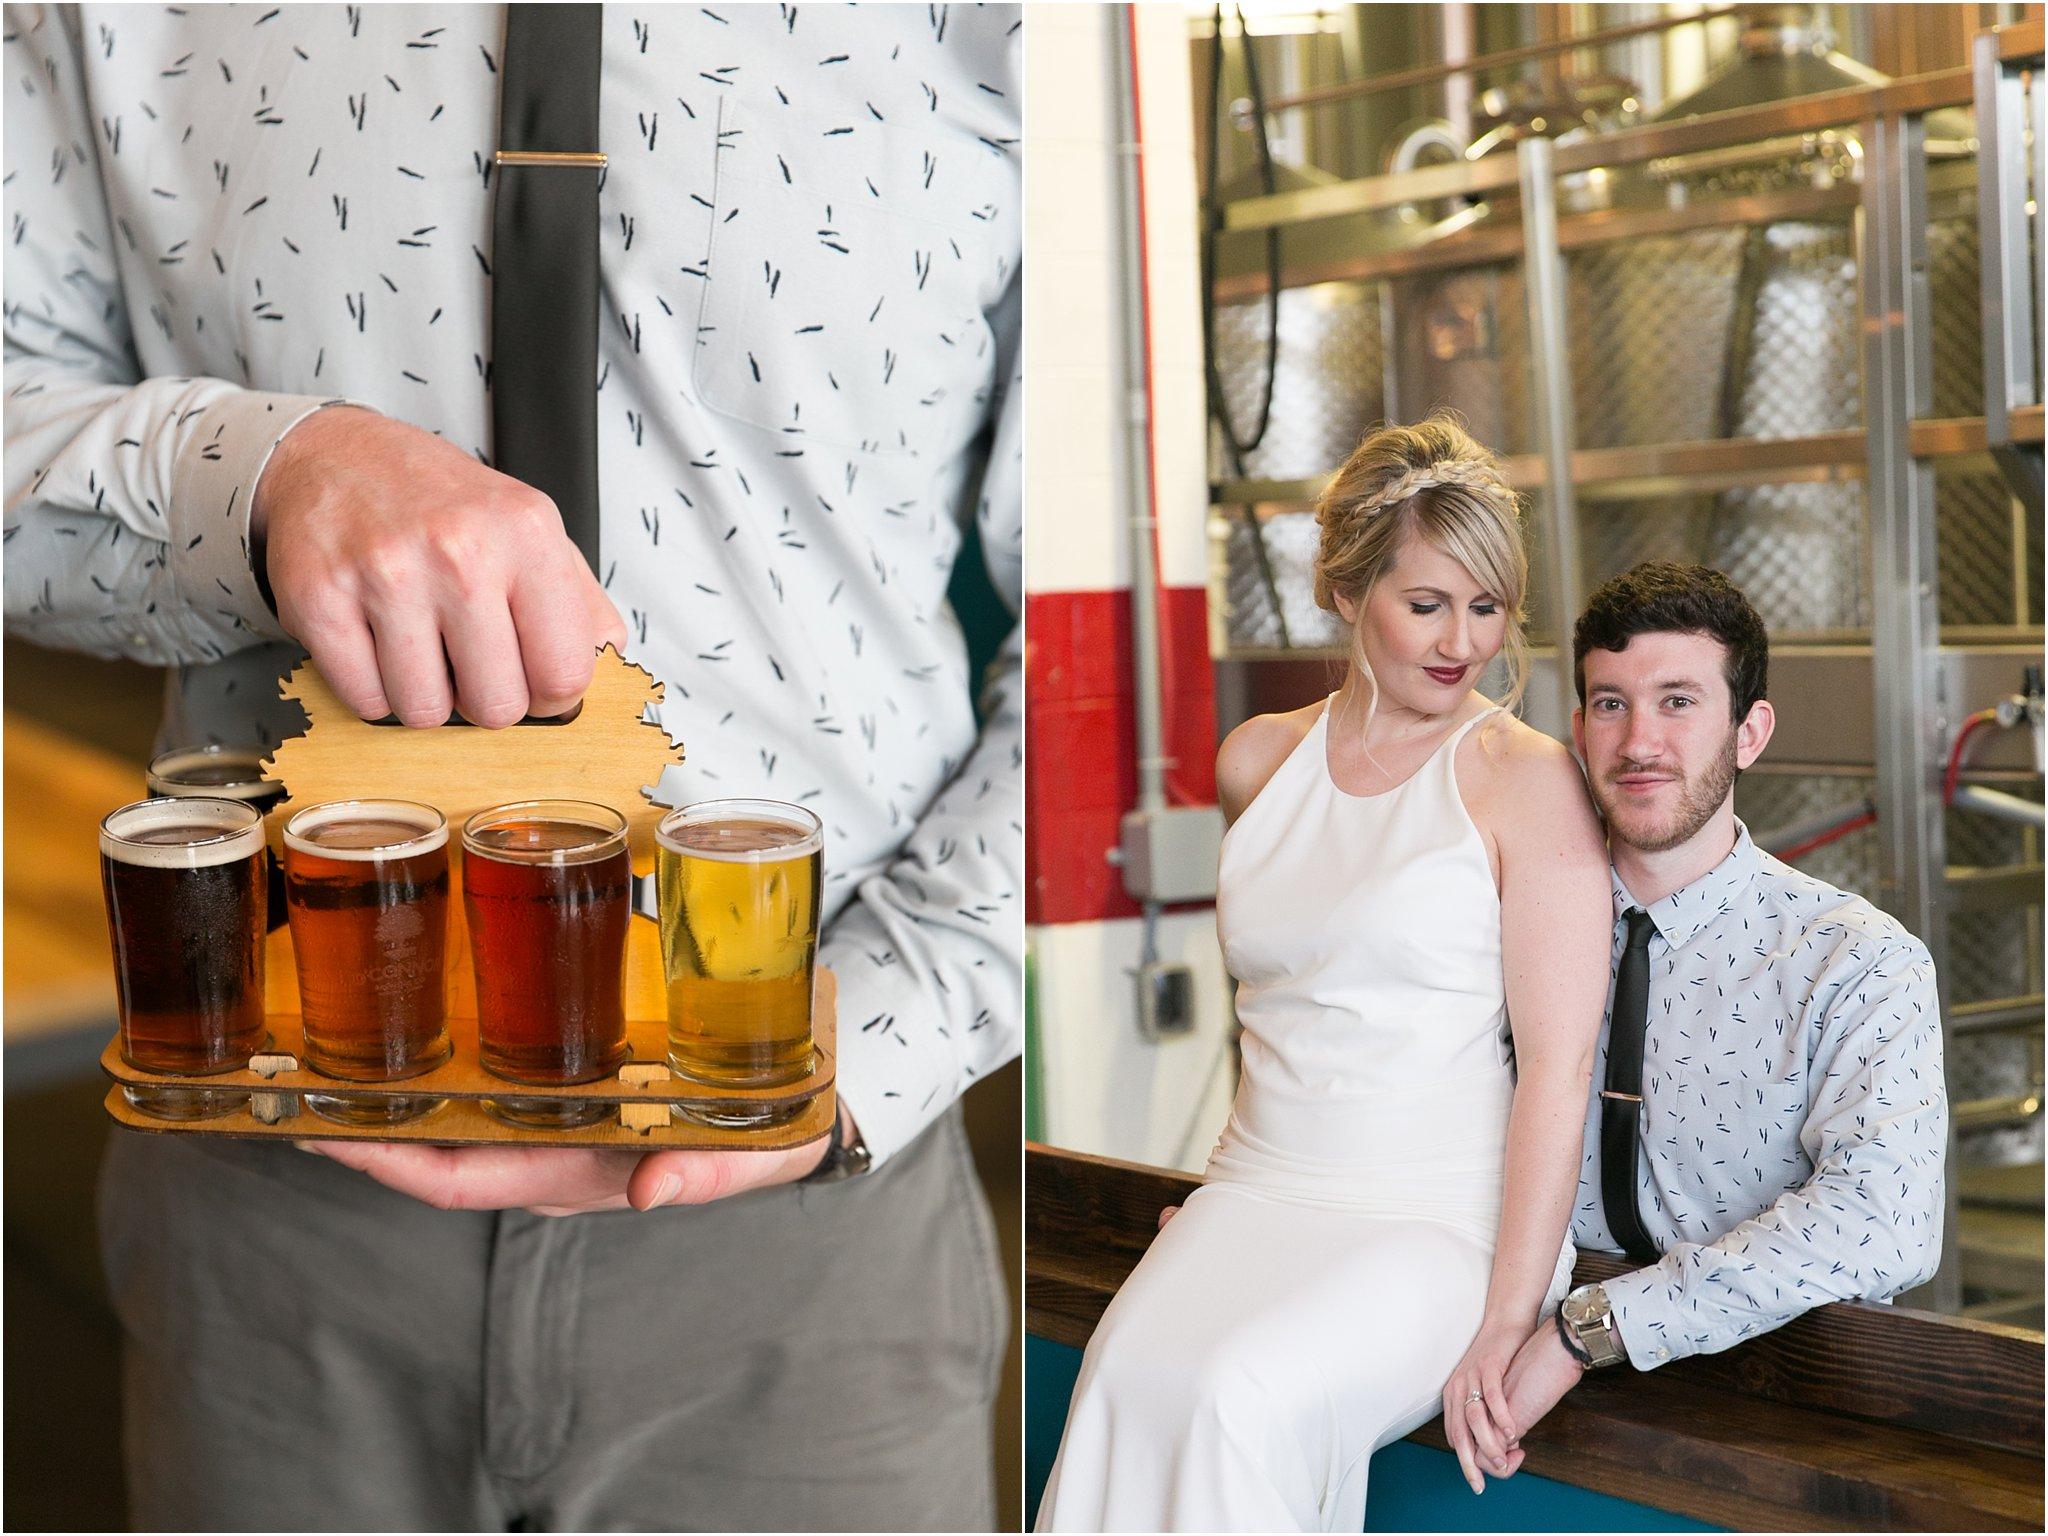 jessica_ryan_photography_oconnor_brewing_wedding_oconnor_brewing_co_norfolk_virginia_roost_flowers_blue_birds_garage__0832